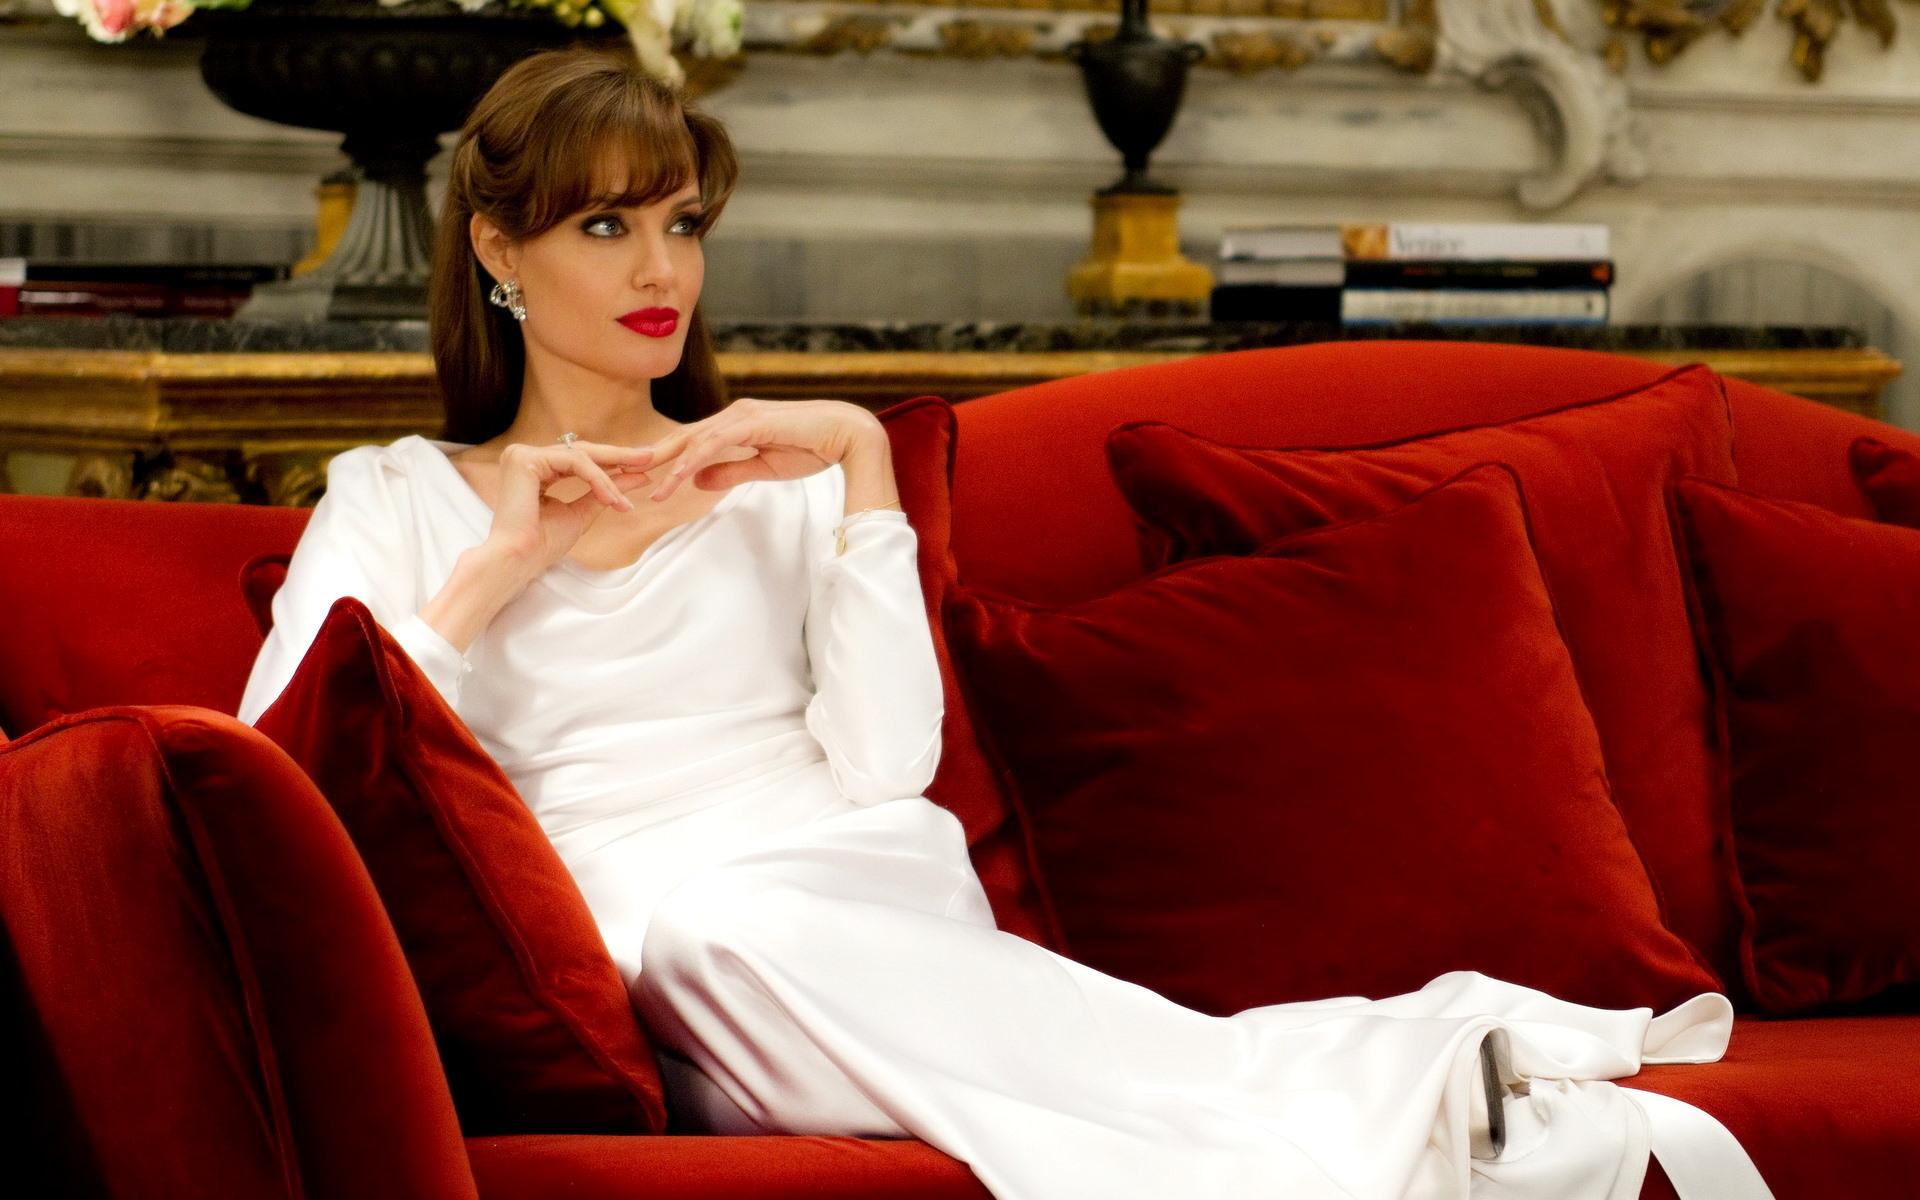 Fondos de pantalla de Angelina Jolie, Wallpapers HD Gratis анджелина джоли